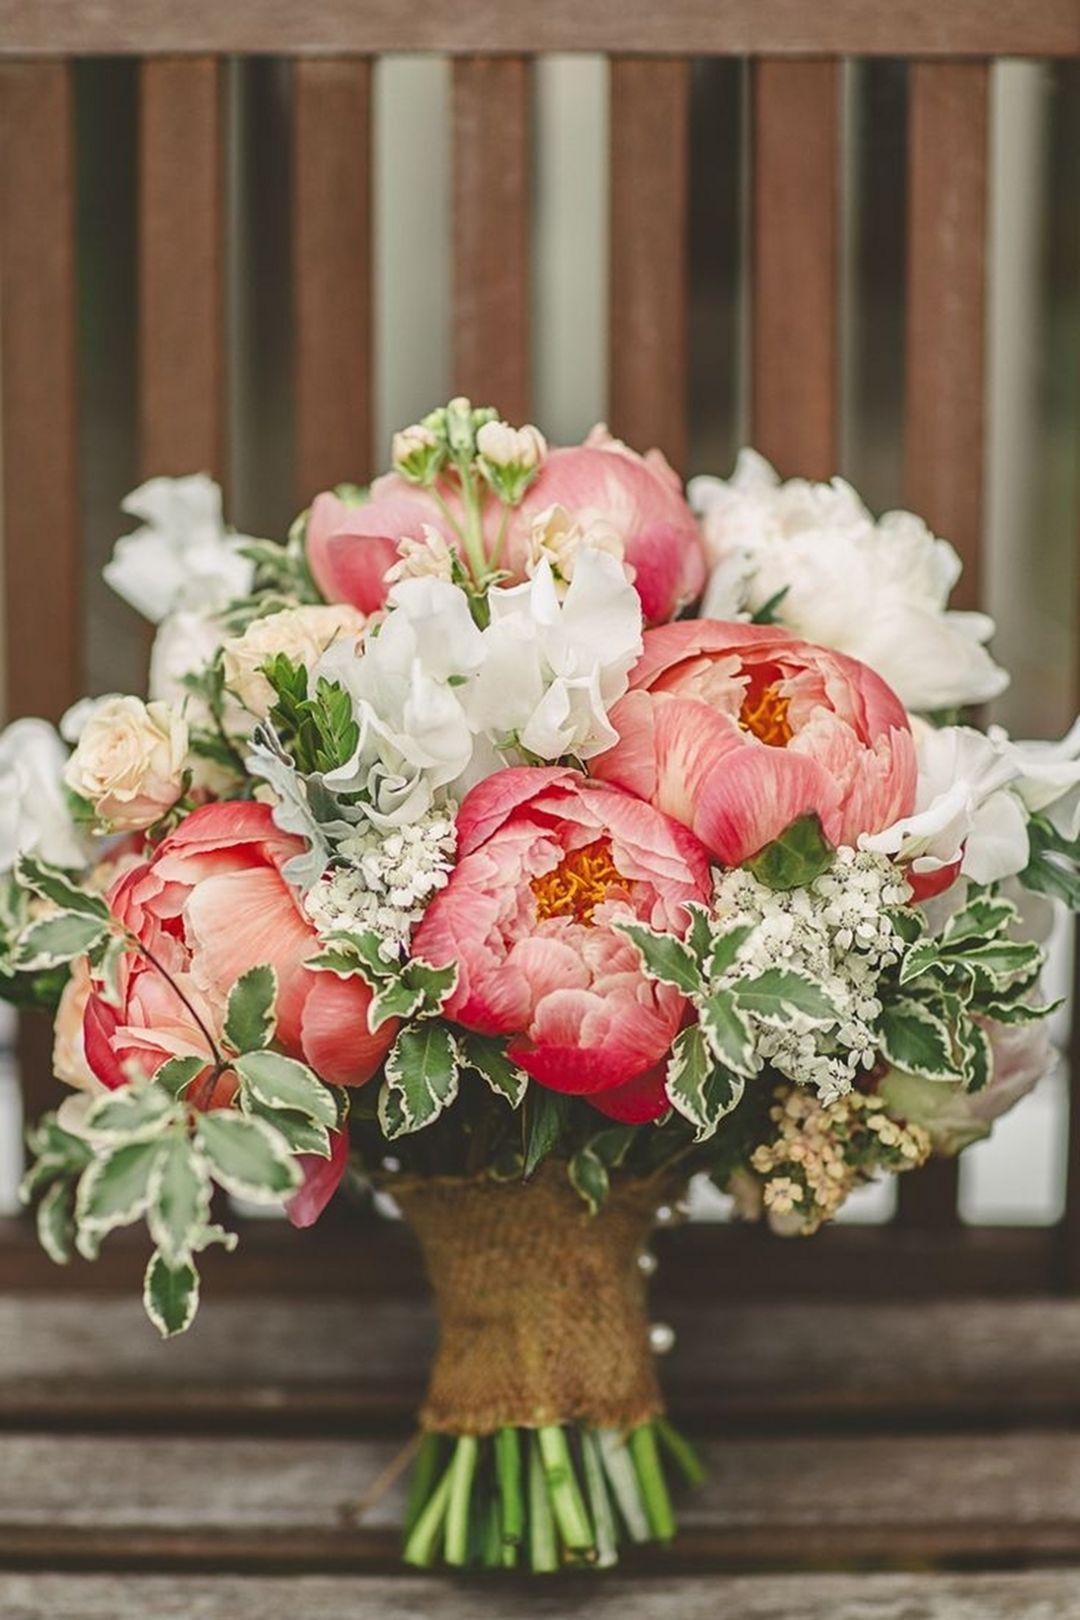 35 Super Beautiful Coral Flower Arrangements Ideas For Your Wedding